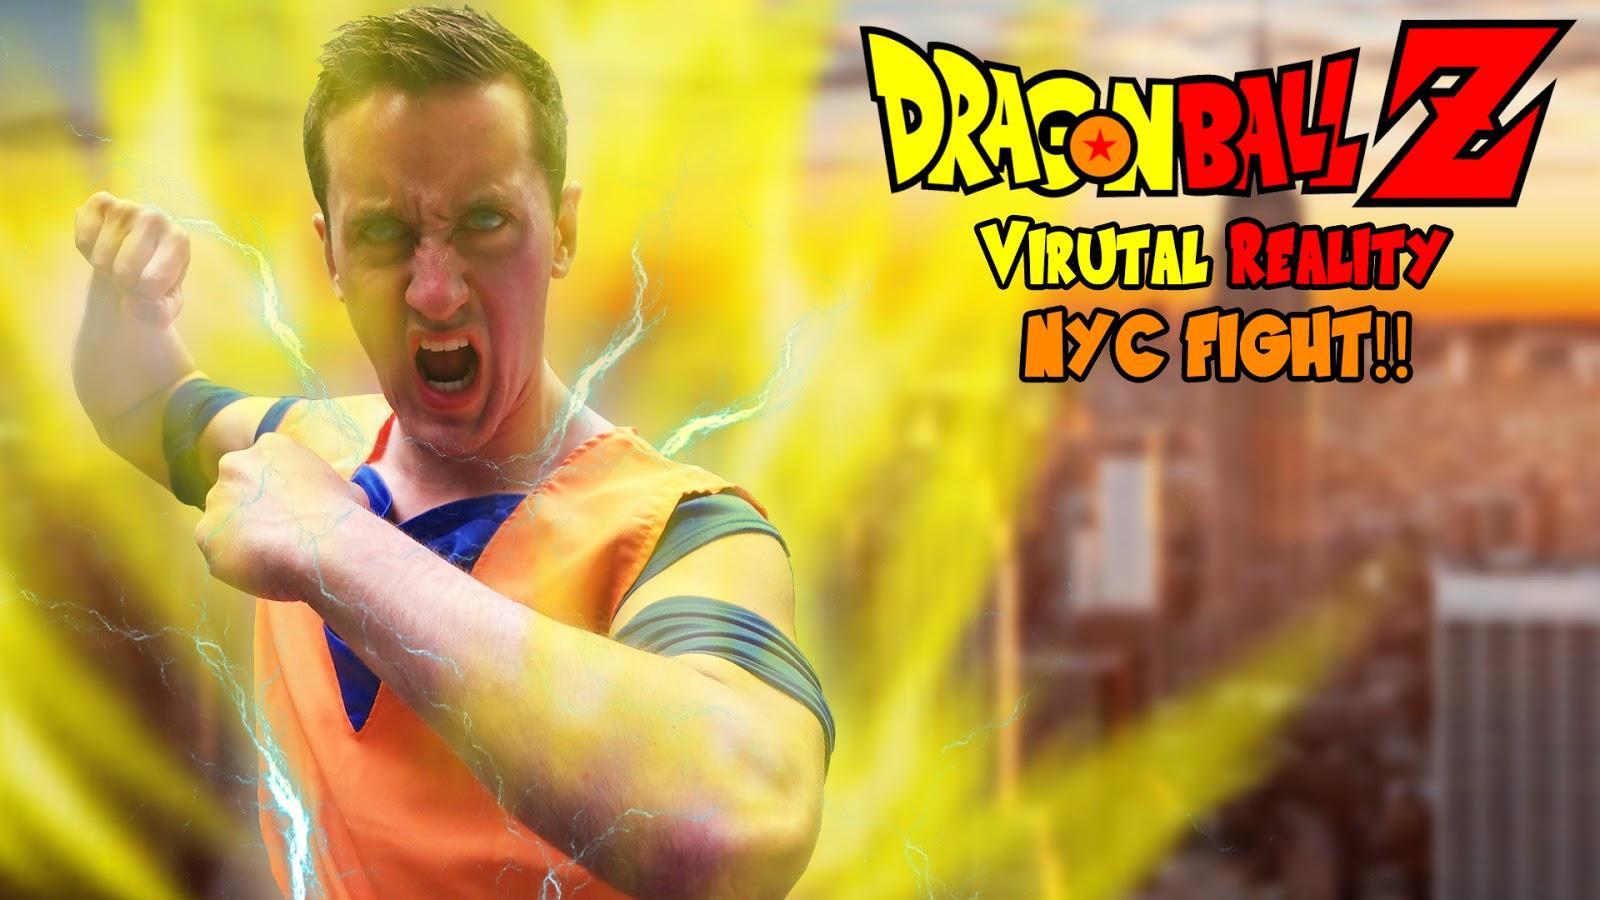 Dragon Ball Z 360 Virtual Reality VR Fight